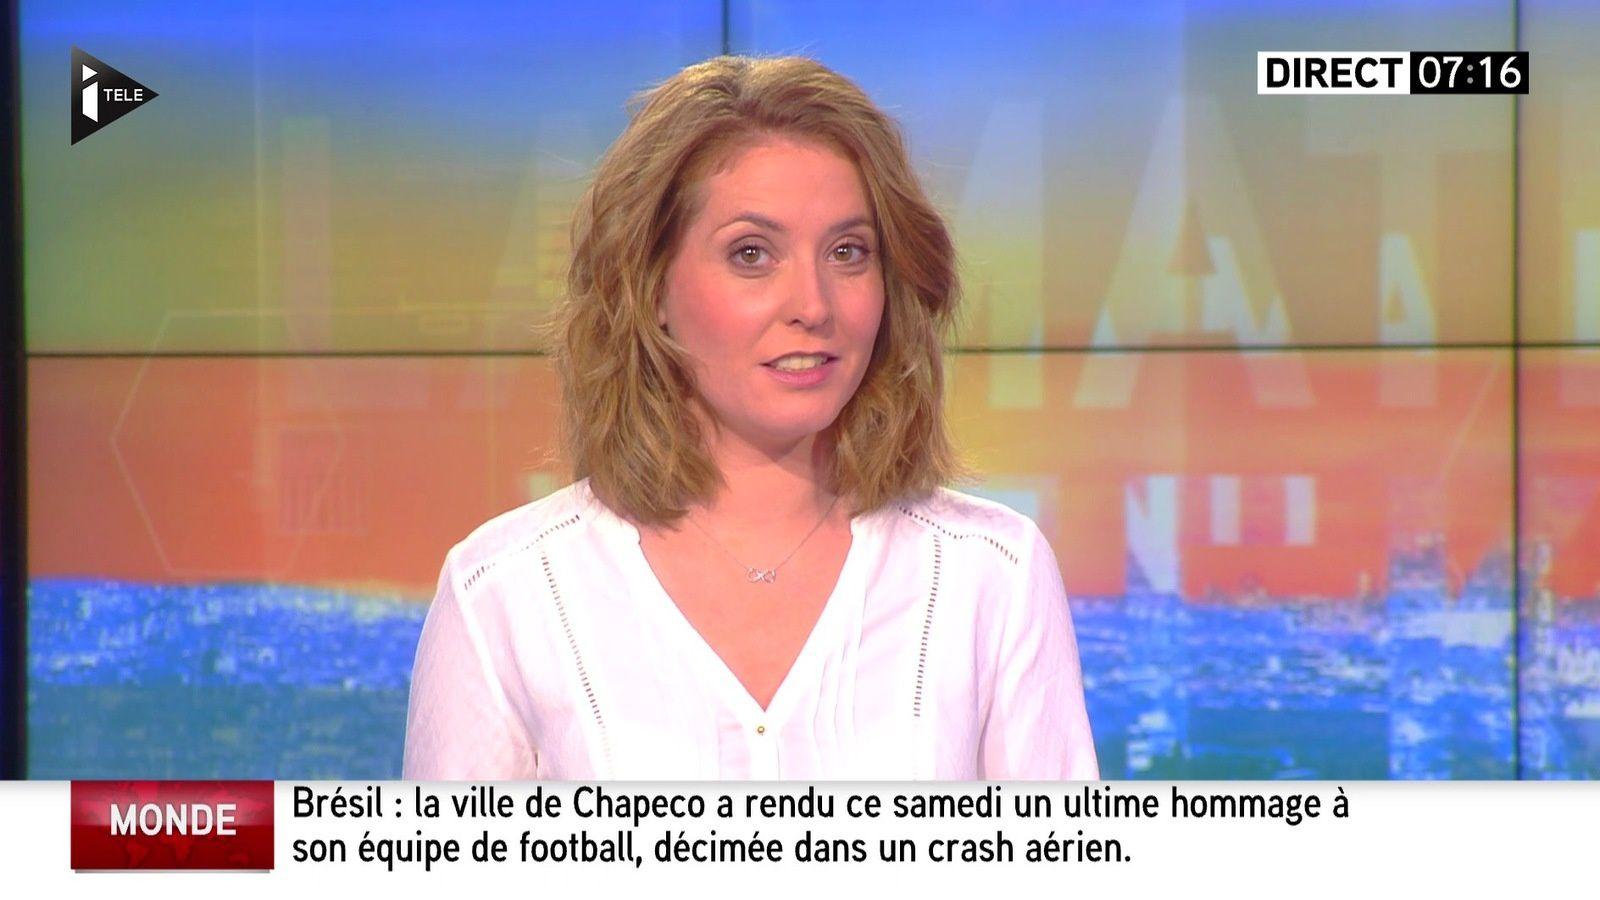 � ELODIE POYADE @ElodiePoyade ce matin #WEMATINALE pour LES SPORTS @ITELE #vuesalatele